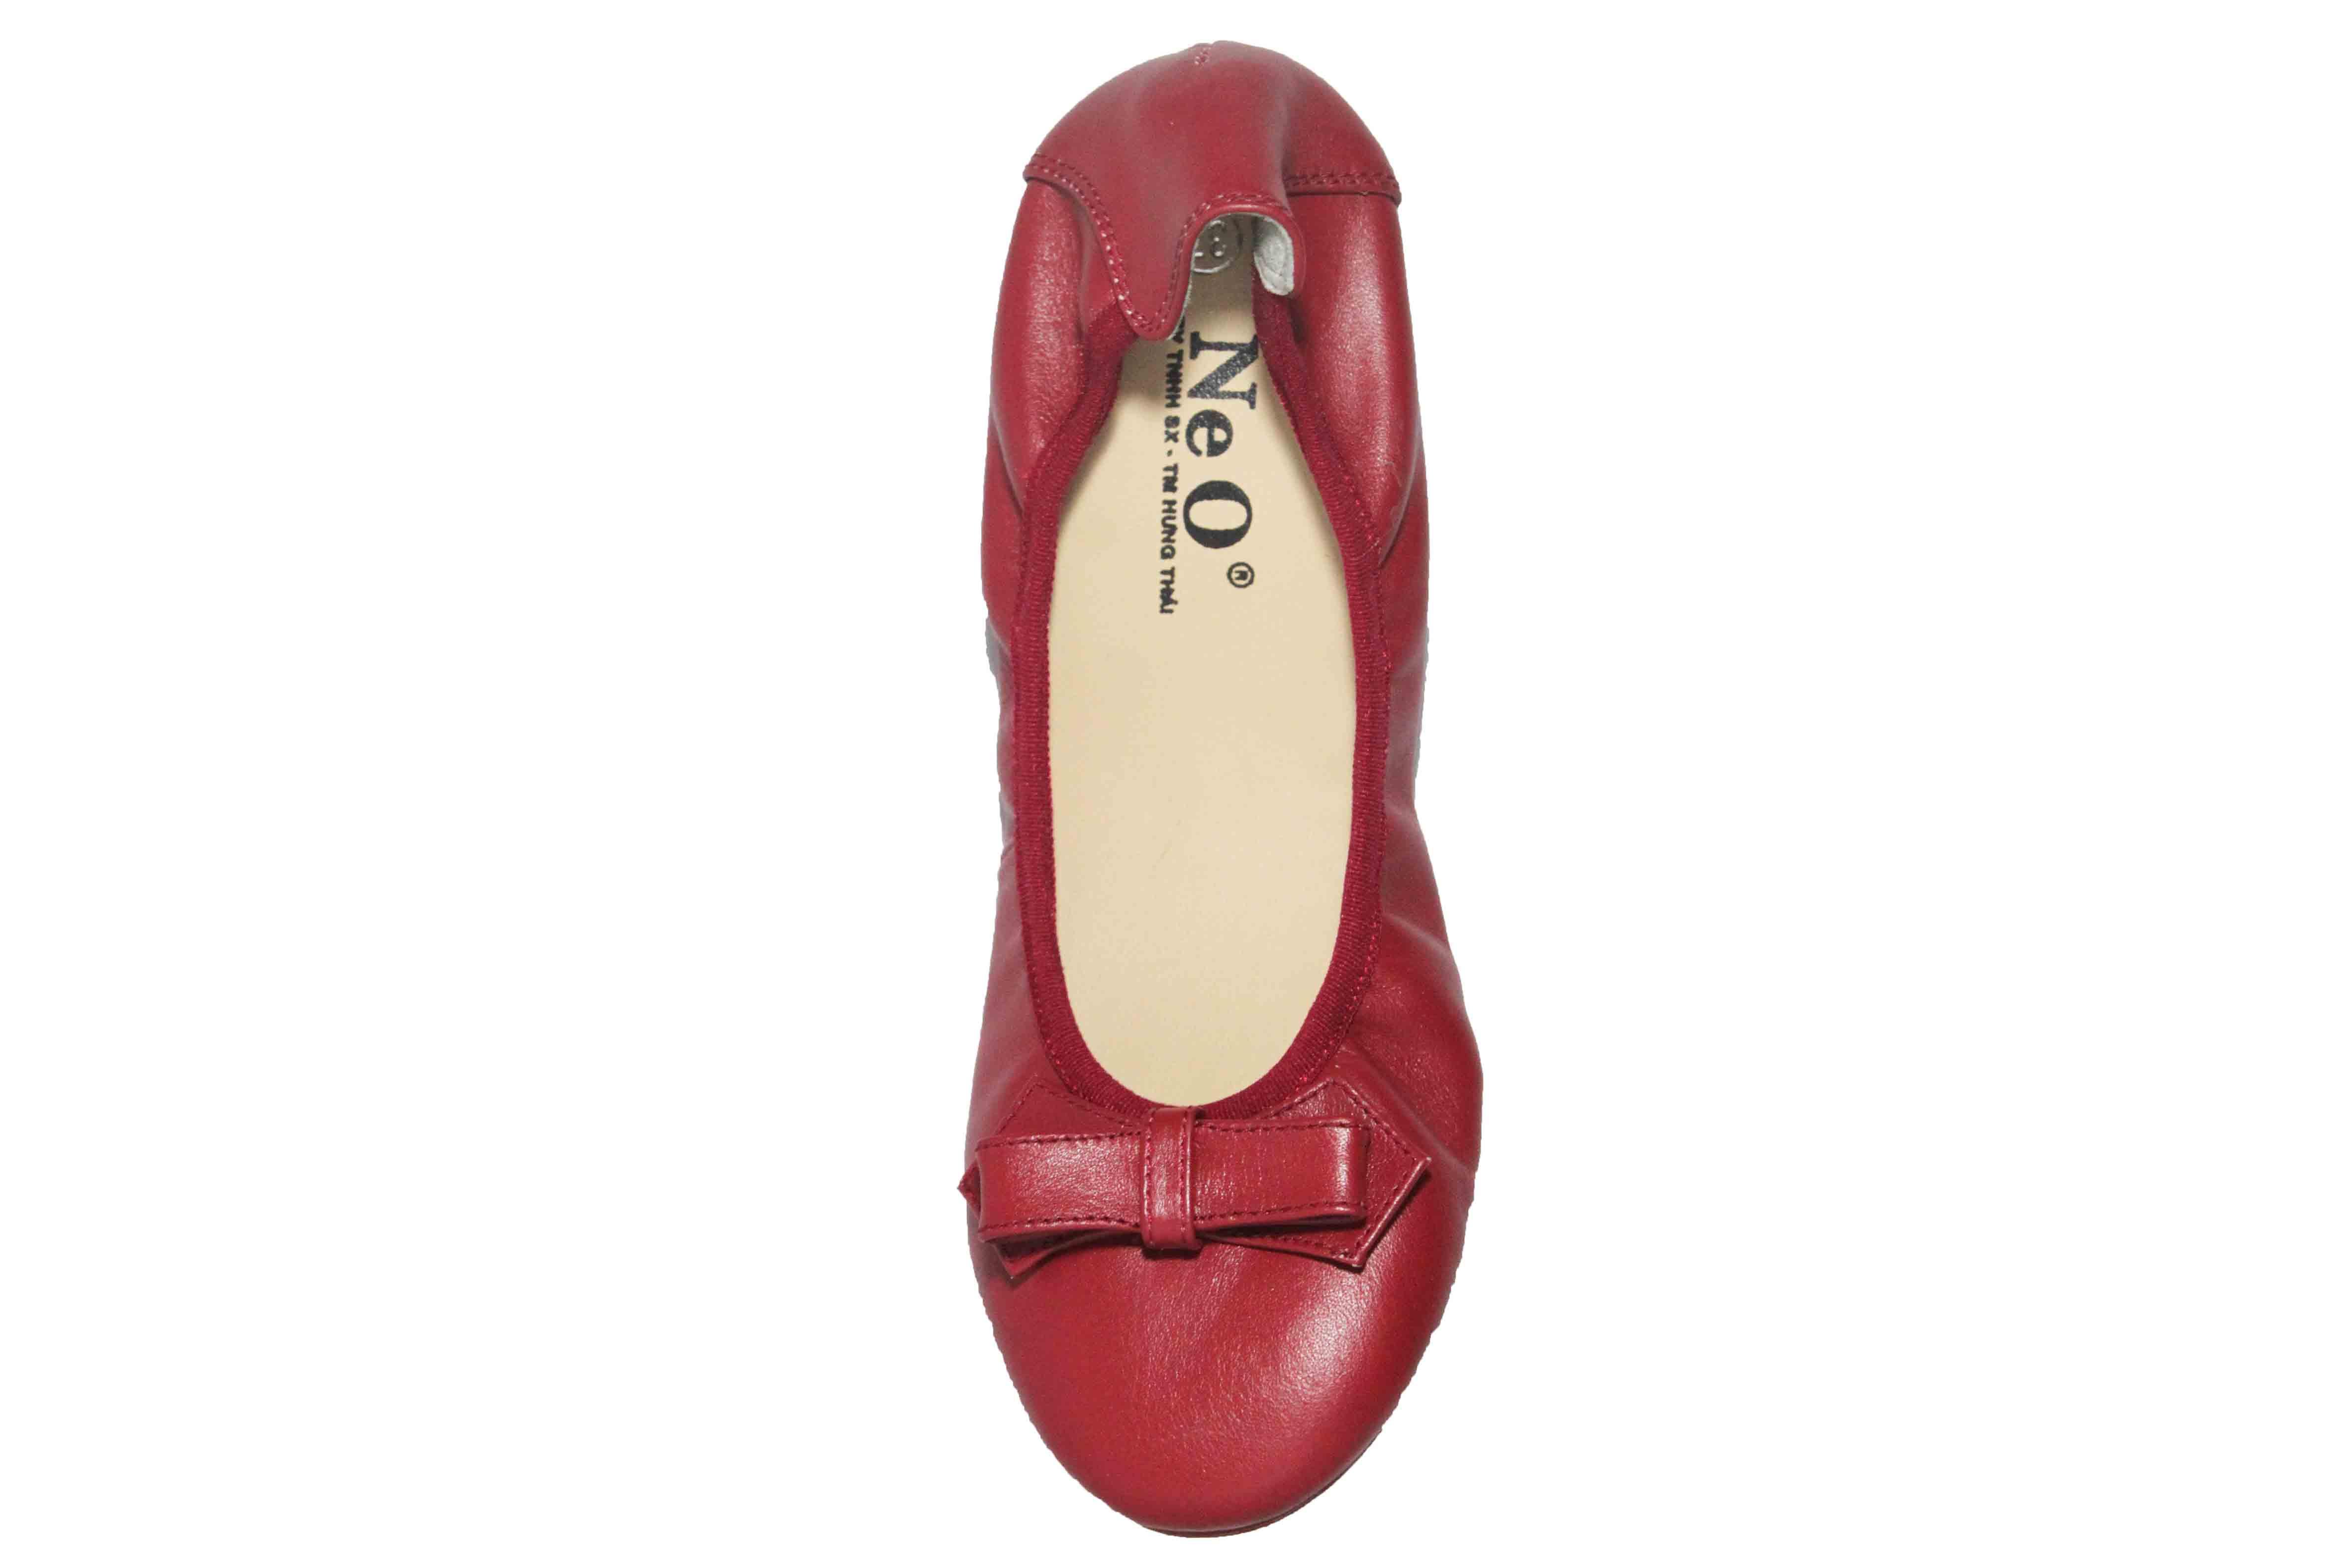 giày bệt chun da mềm